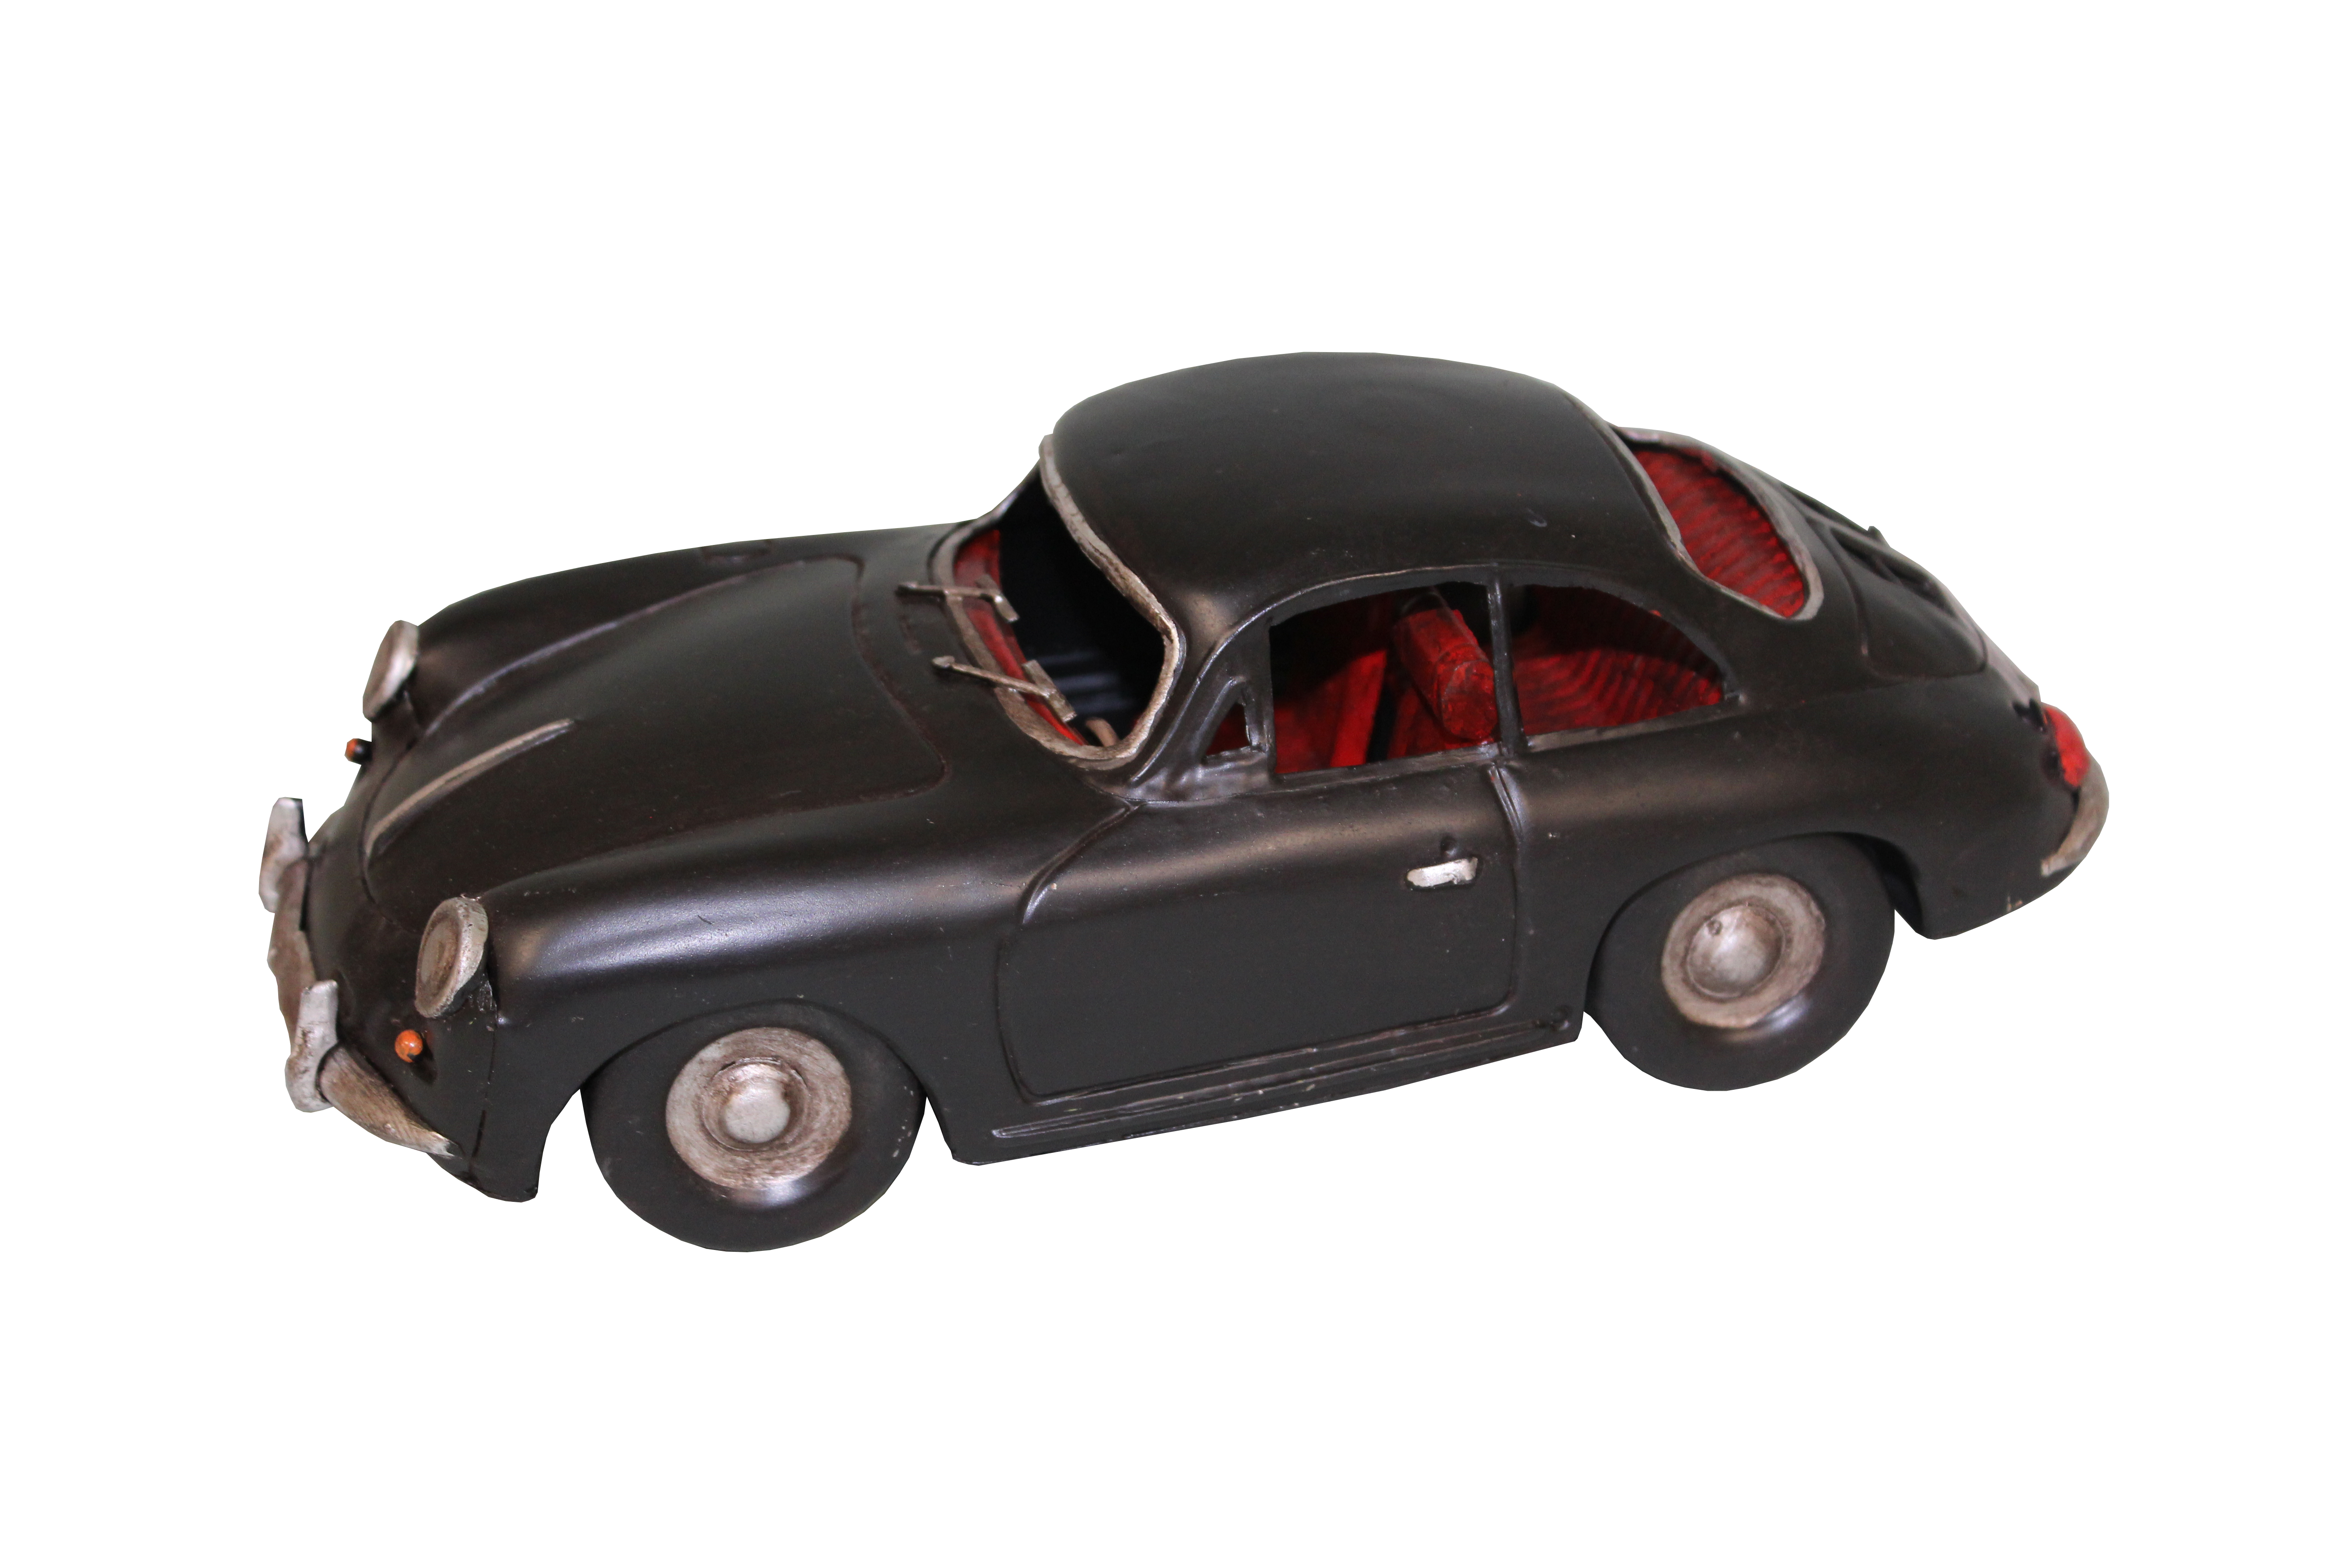 Декоративный автомобиль PorscheДругое<br><br><br>Material: Железо<br>Length см: None<br>Width см: 26.4<br>Depth см: 11<br>Height см: 8.8